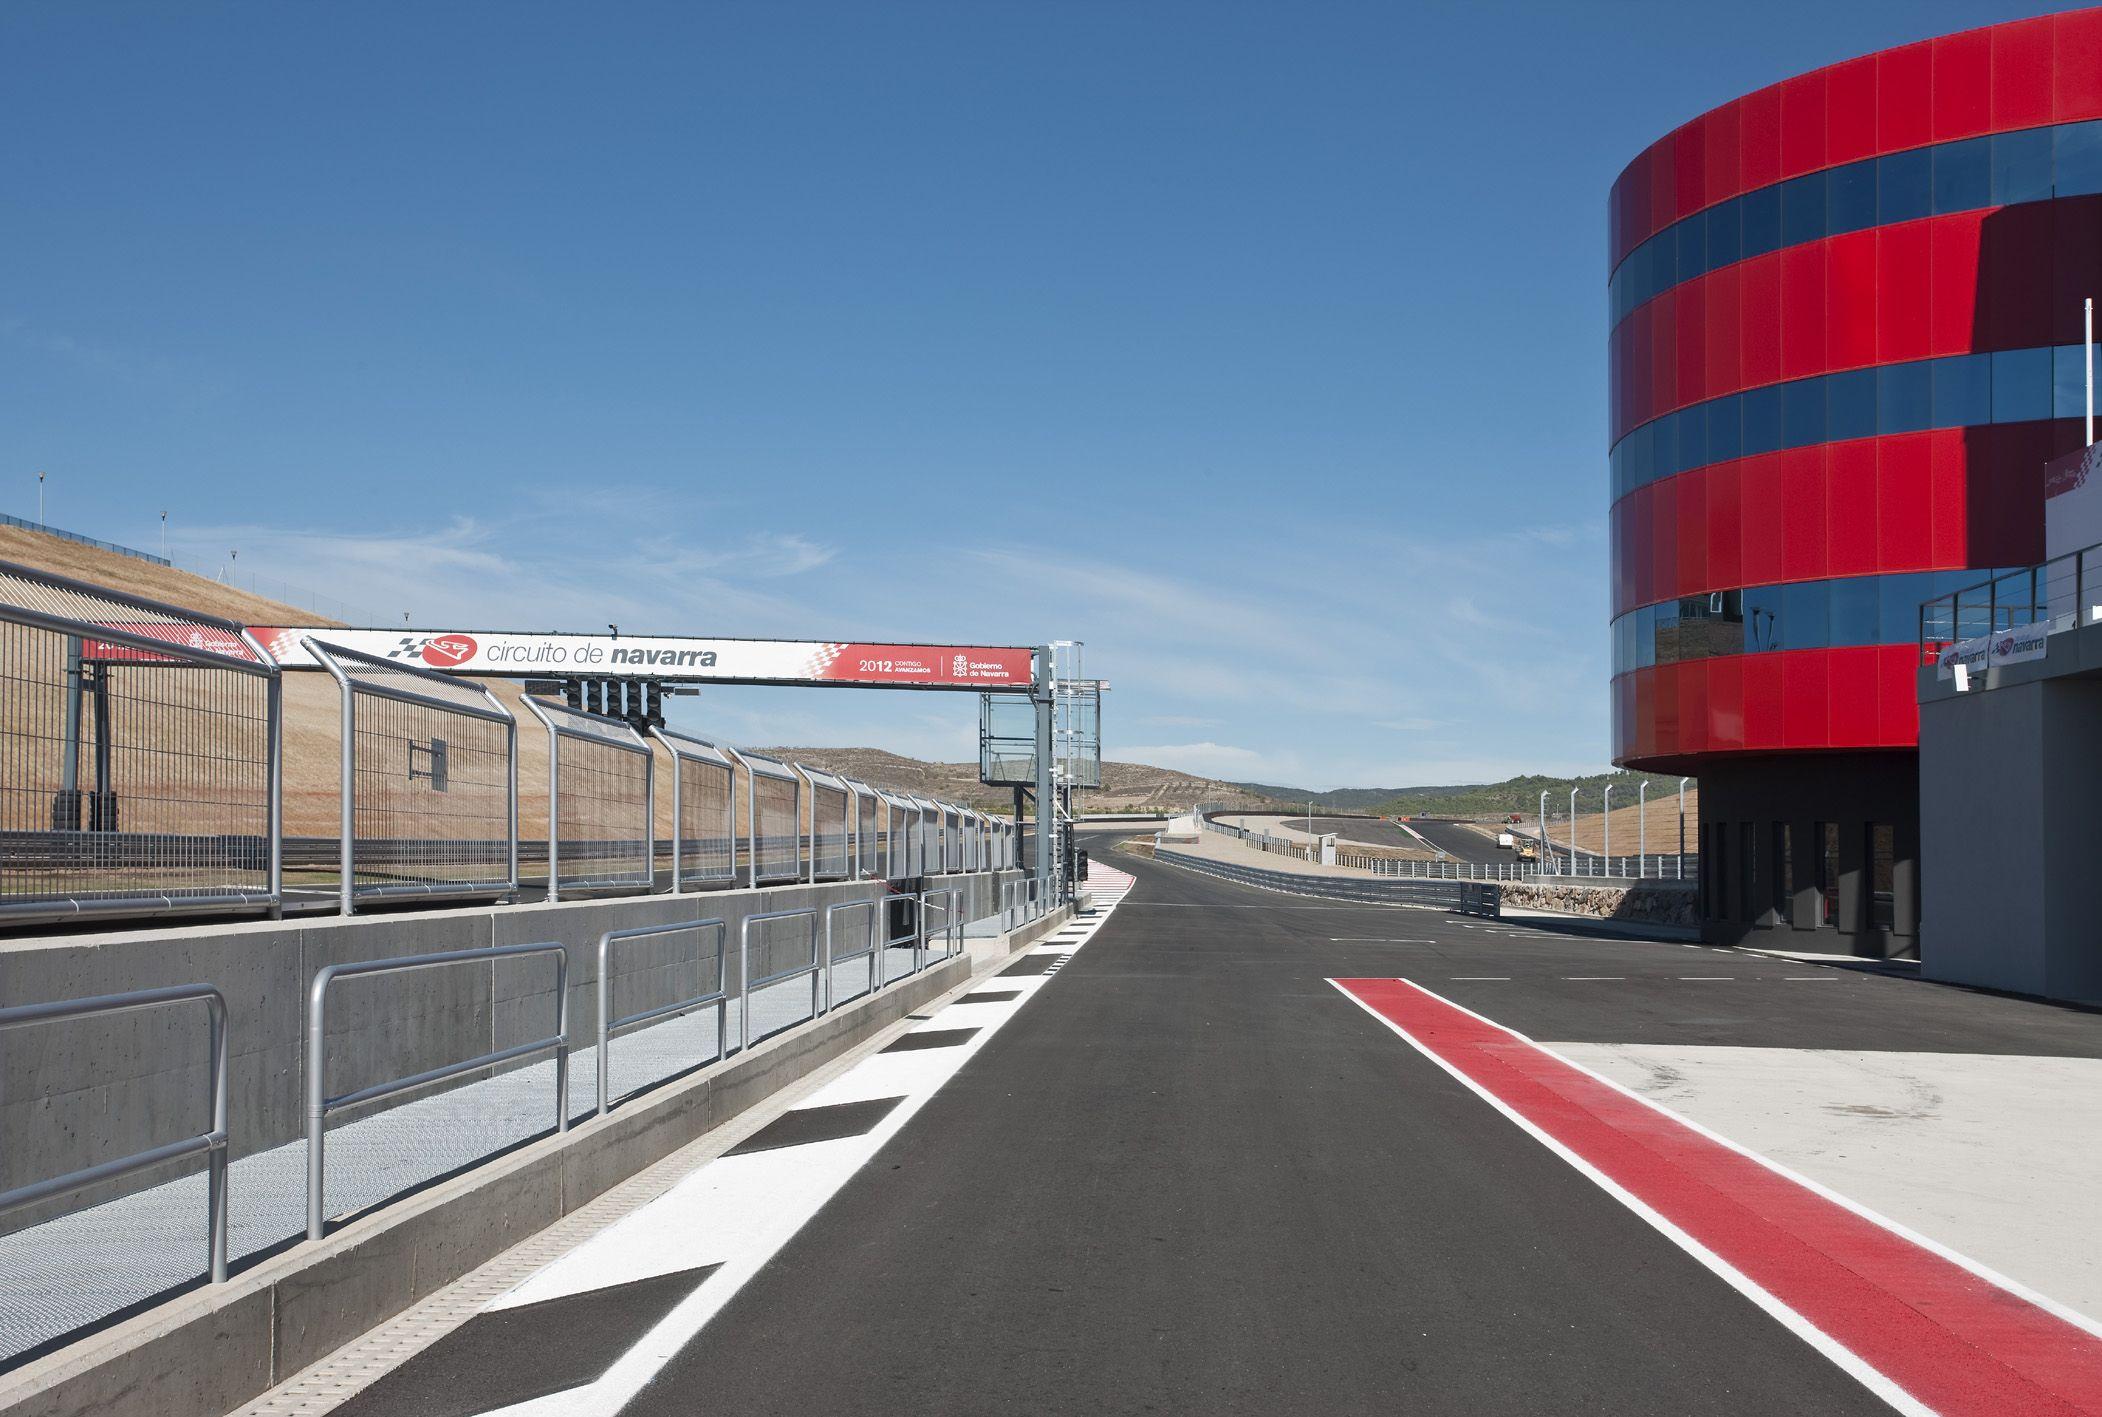 Circuito Los Arcos : Linha monoblock canais de concreto polímero obra circuito los